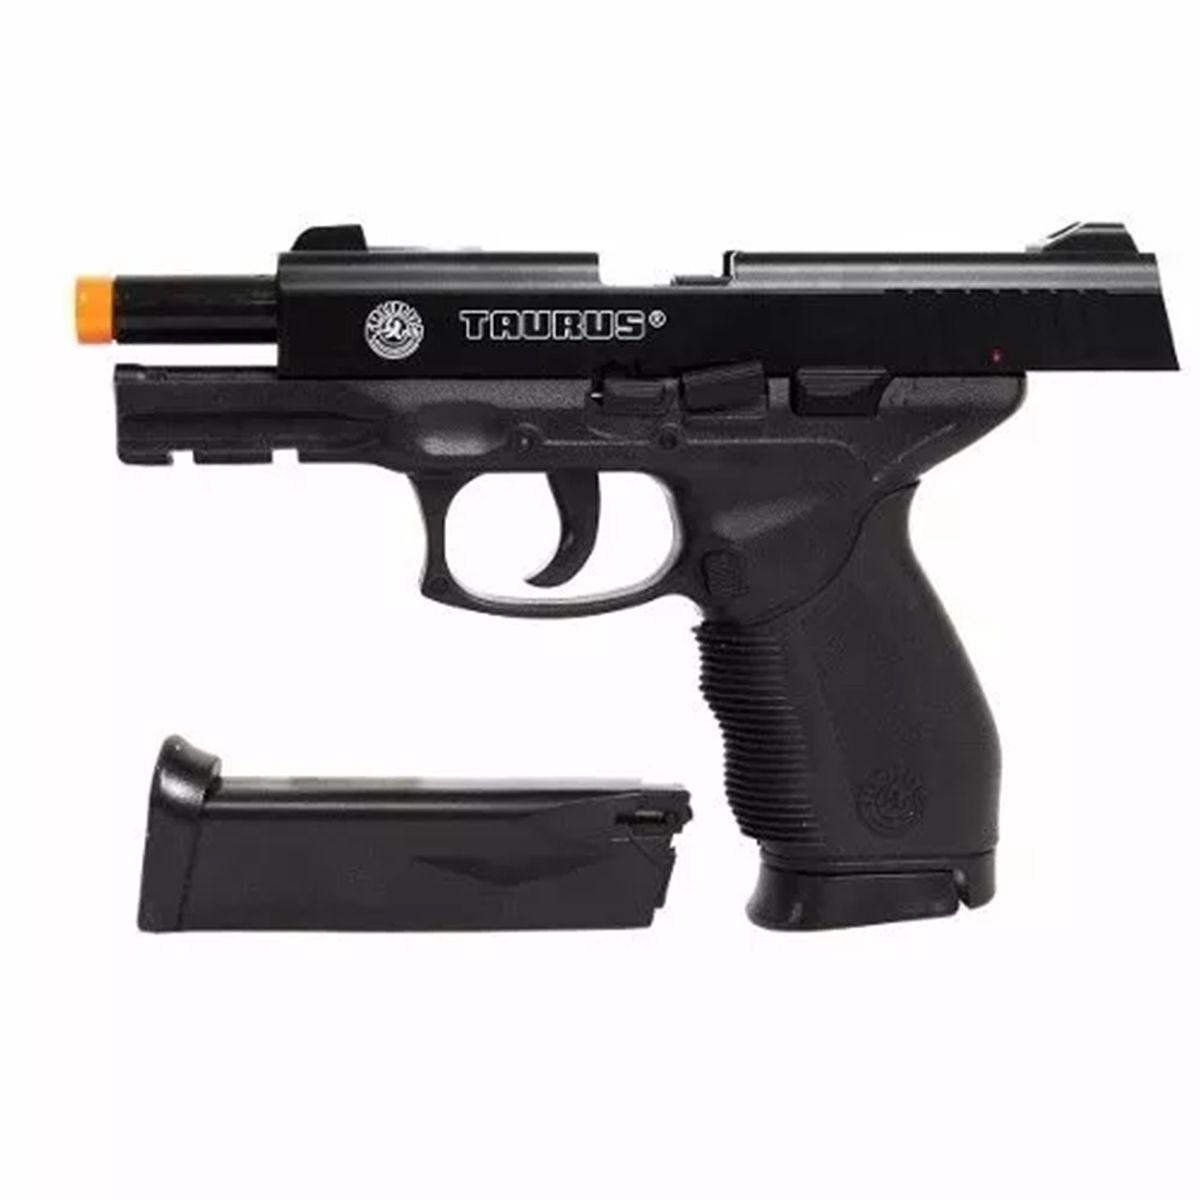 Pistola Airsoft Spring Taurus PT24/7 Cybergun + Magazine Extra - 6mm  - Combat Airsoft